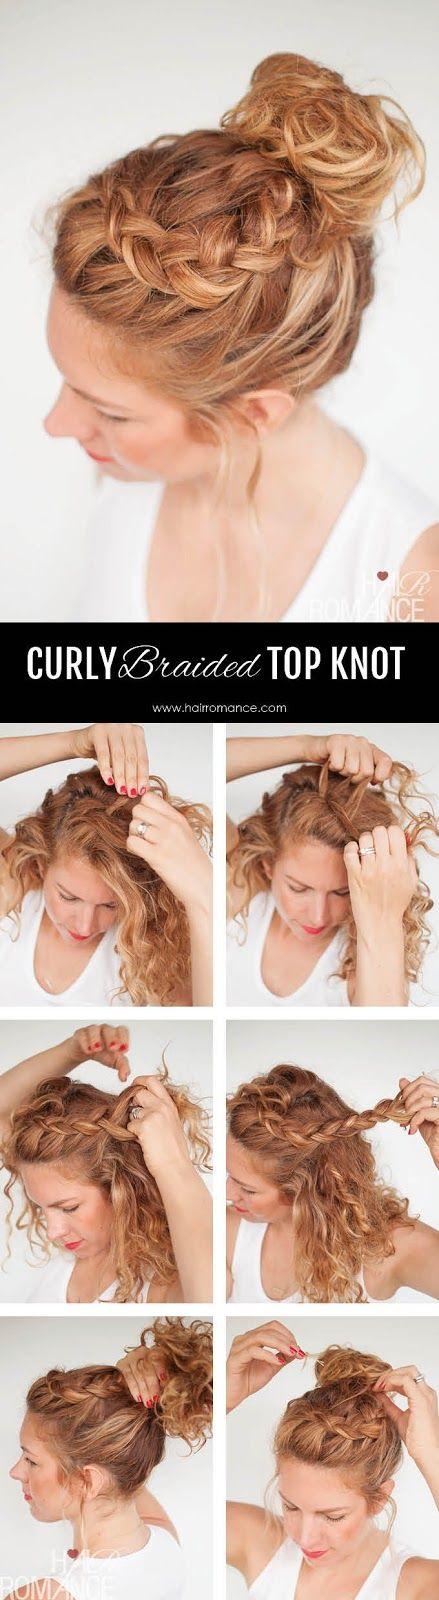 DIVINA EJECUTIVA: 5 Peinados para cabellos ondulados